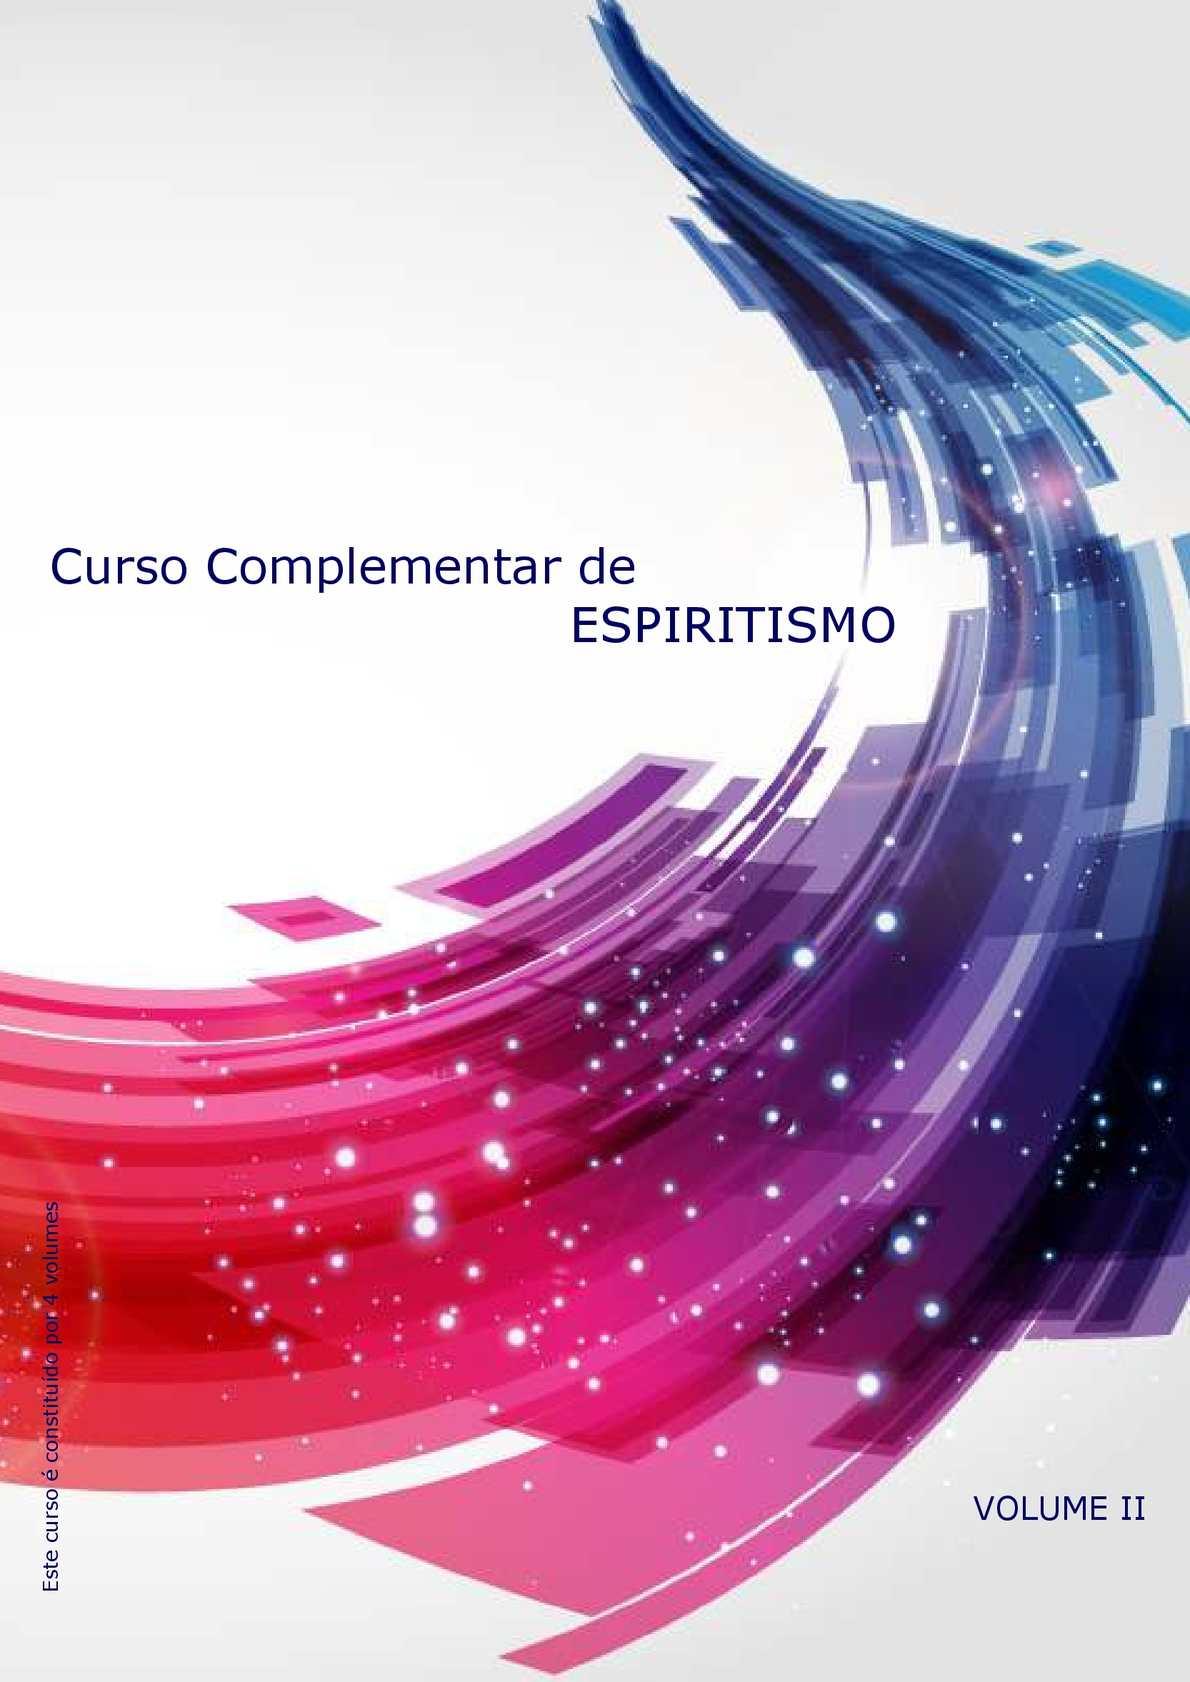 Calaméo - CCE VOLUME II 9e9b557b07